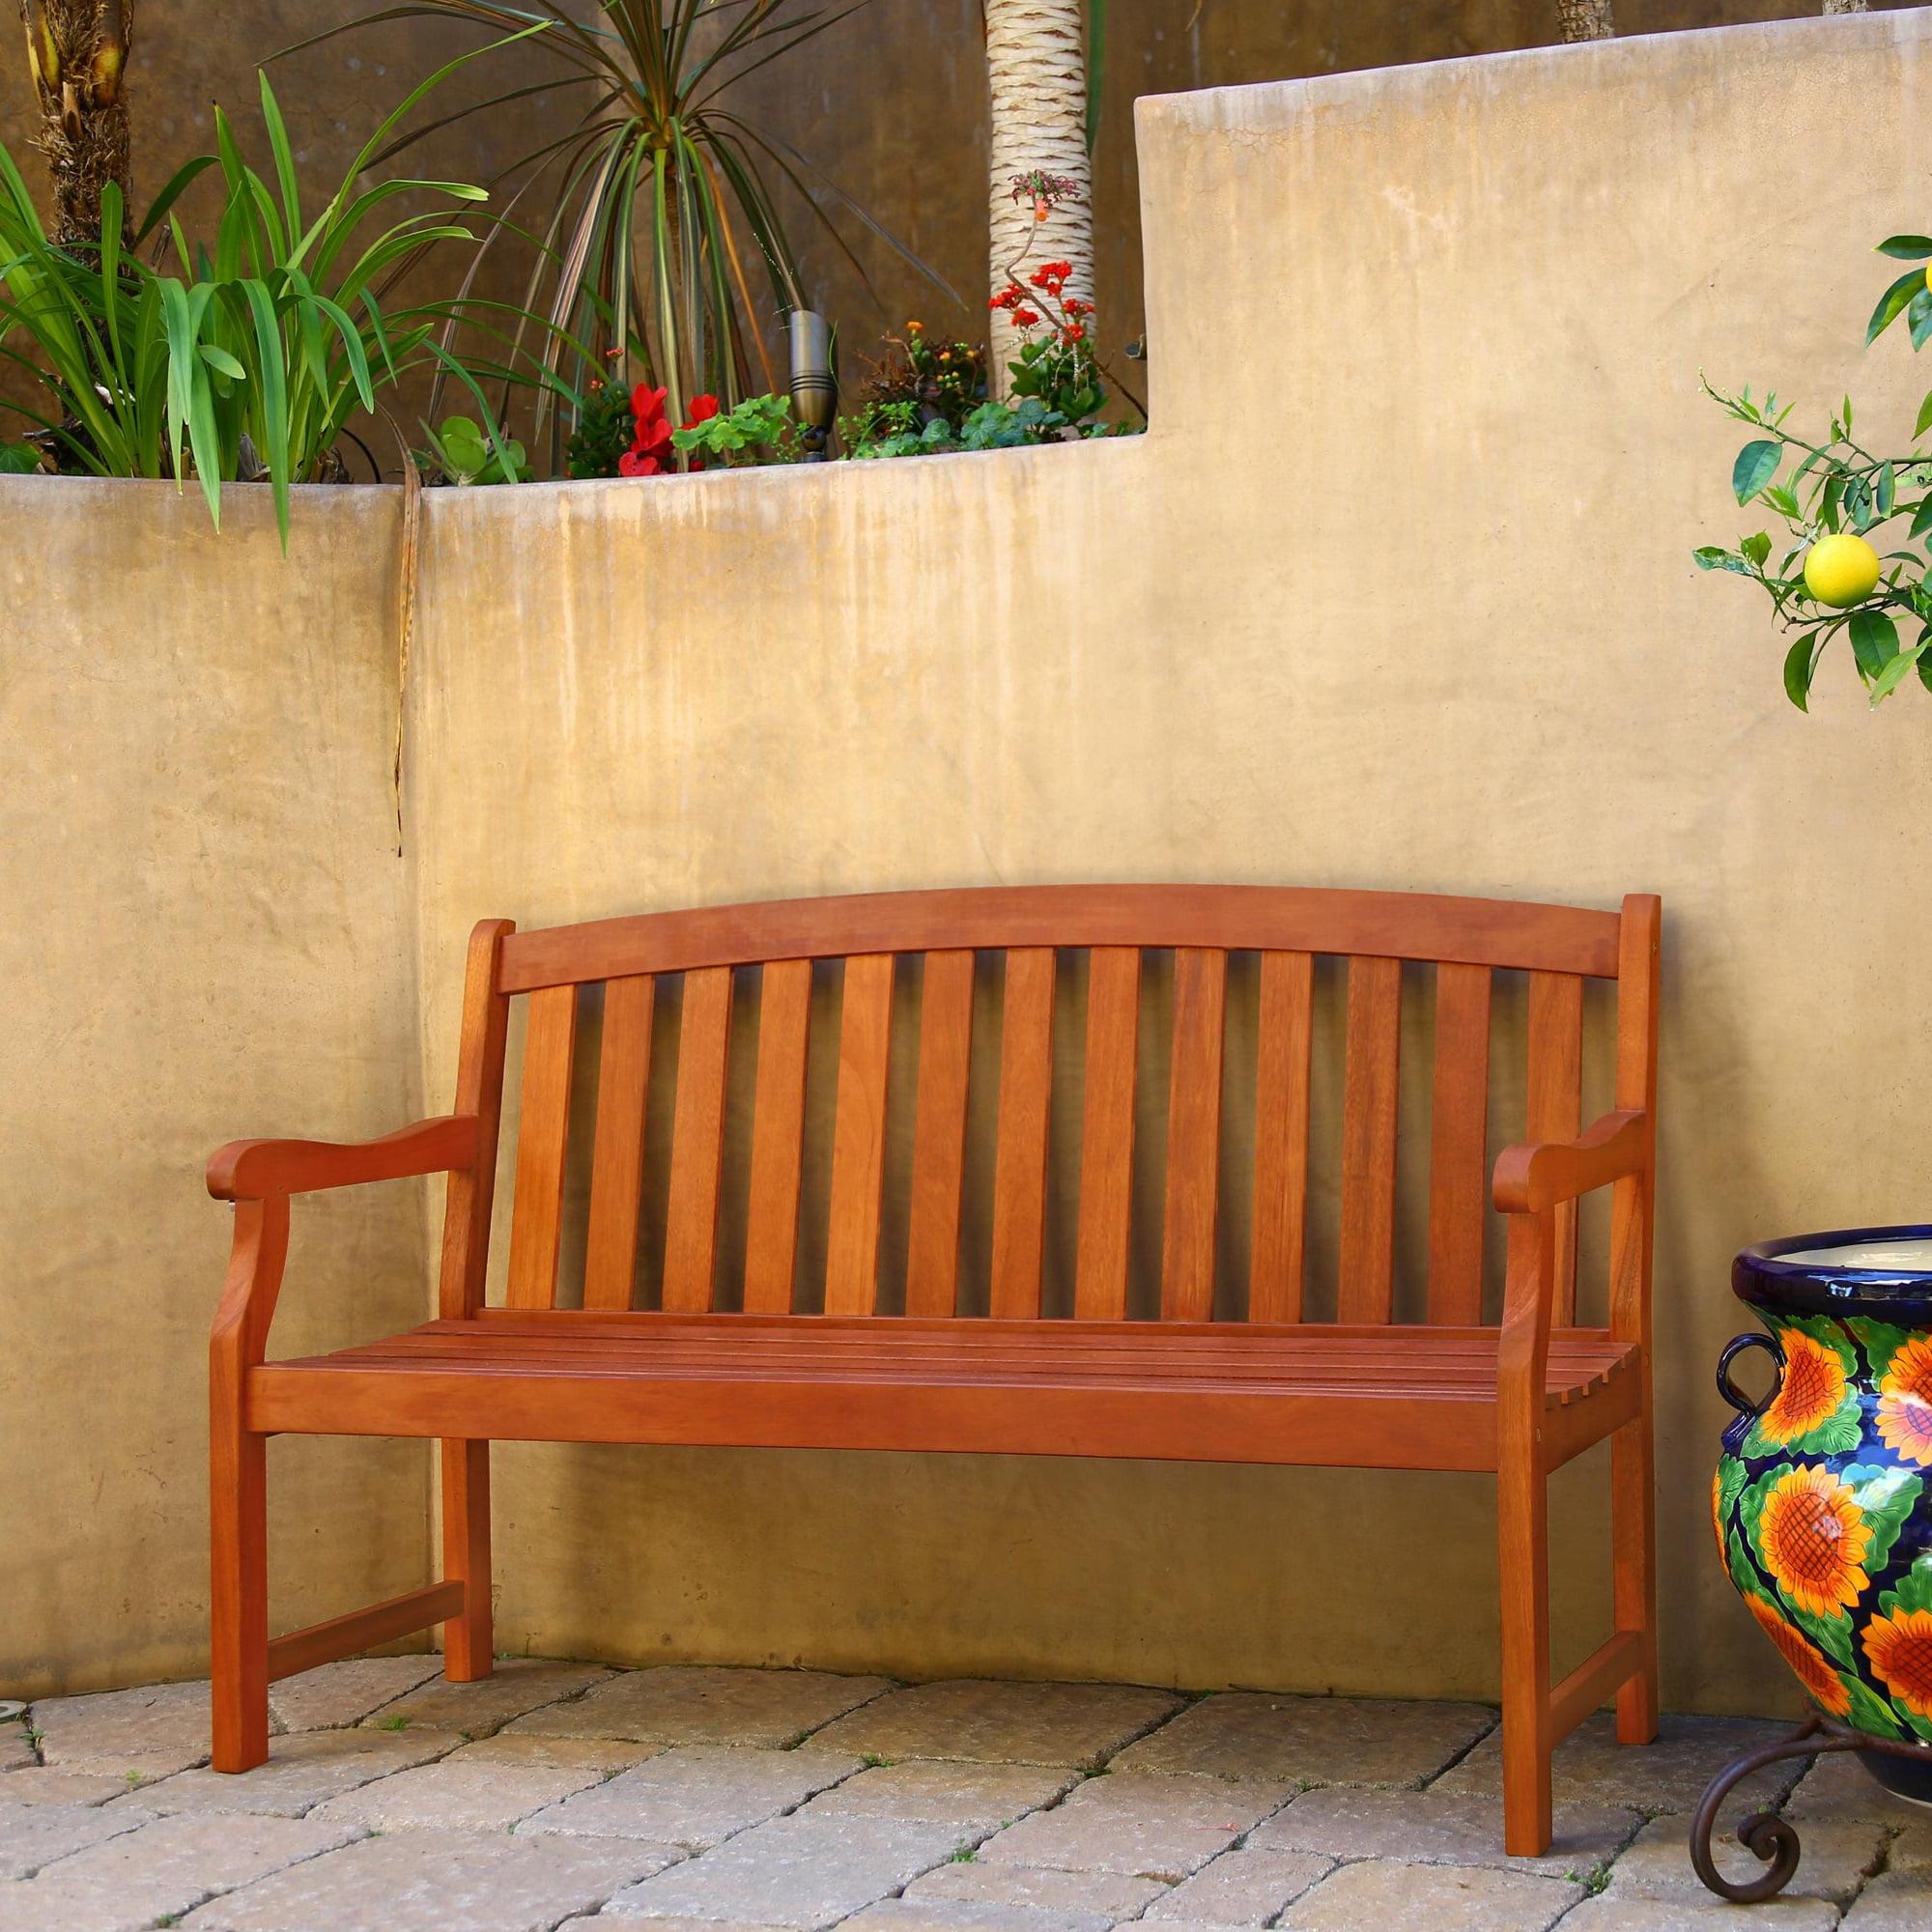 Outdoor Eucalyptus Wood Bench